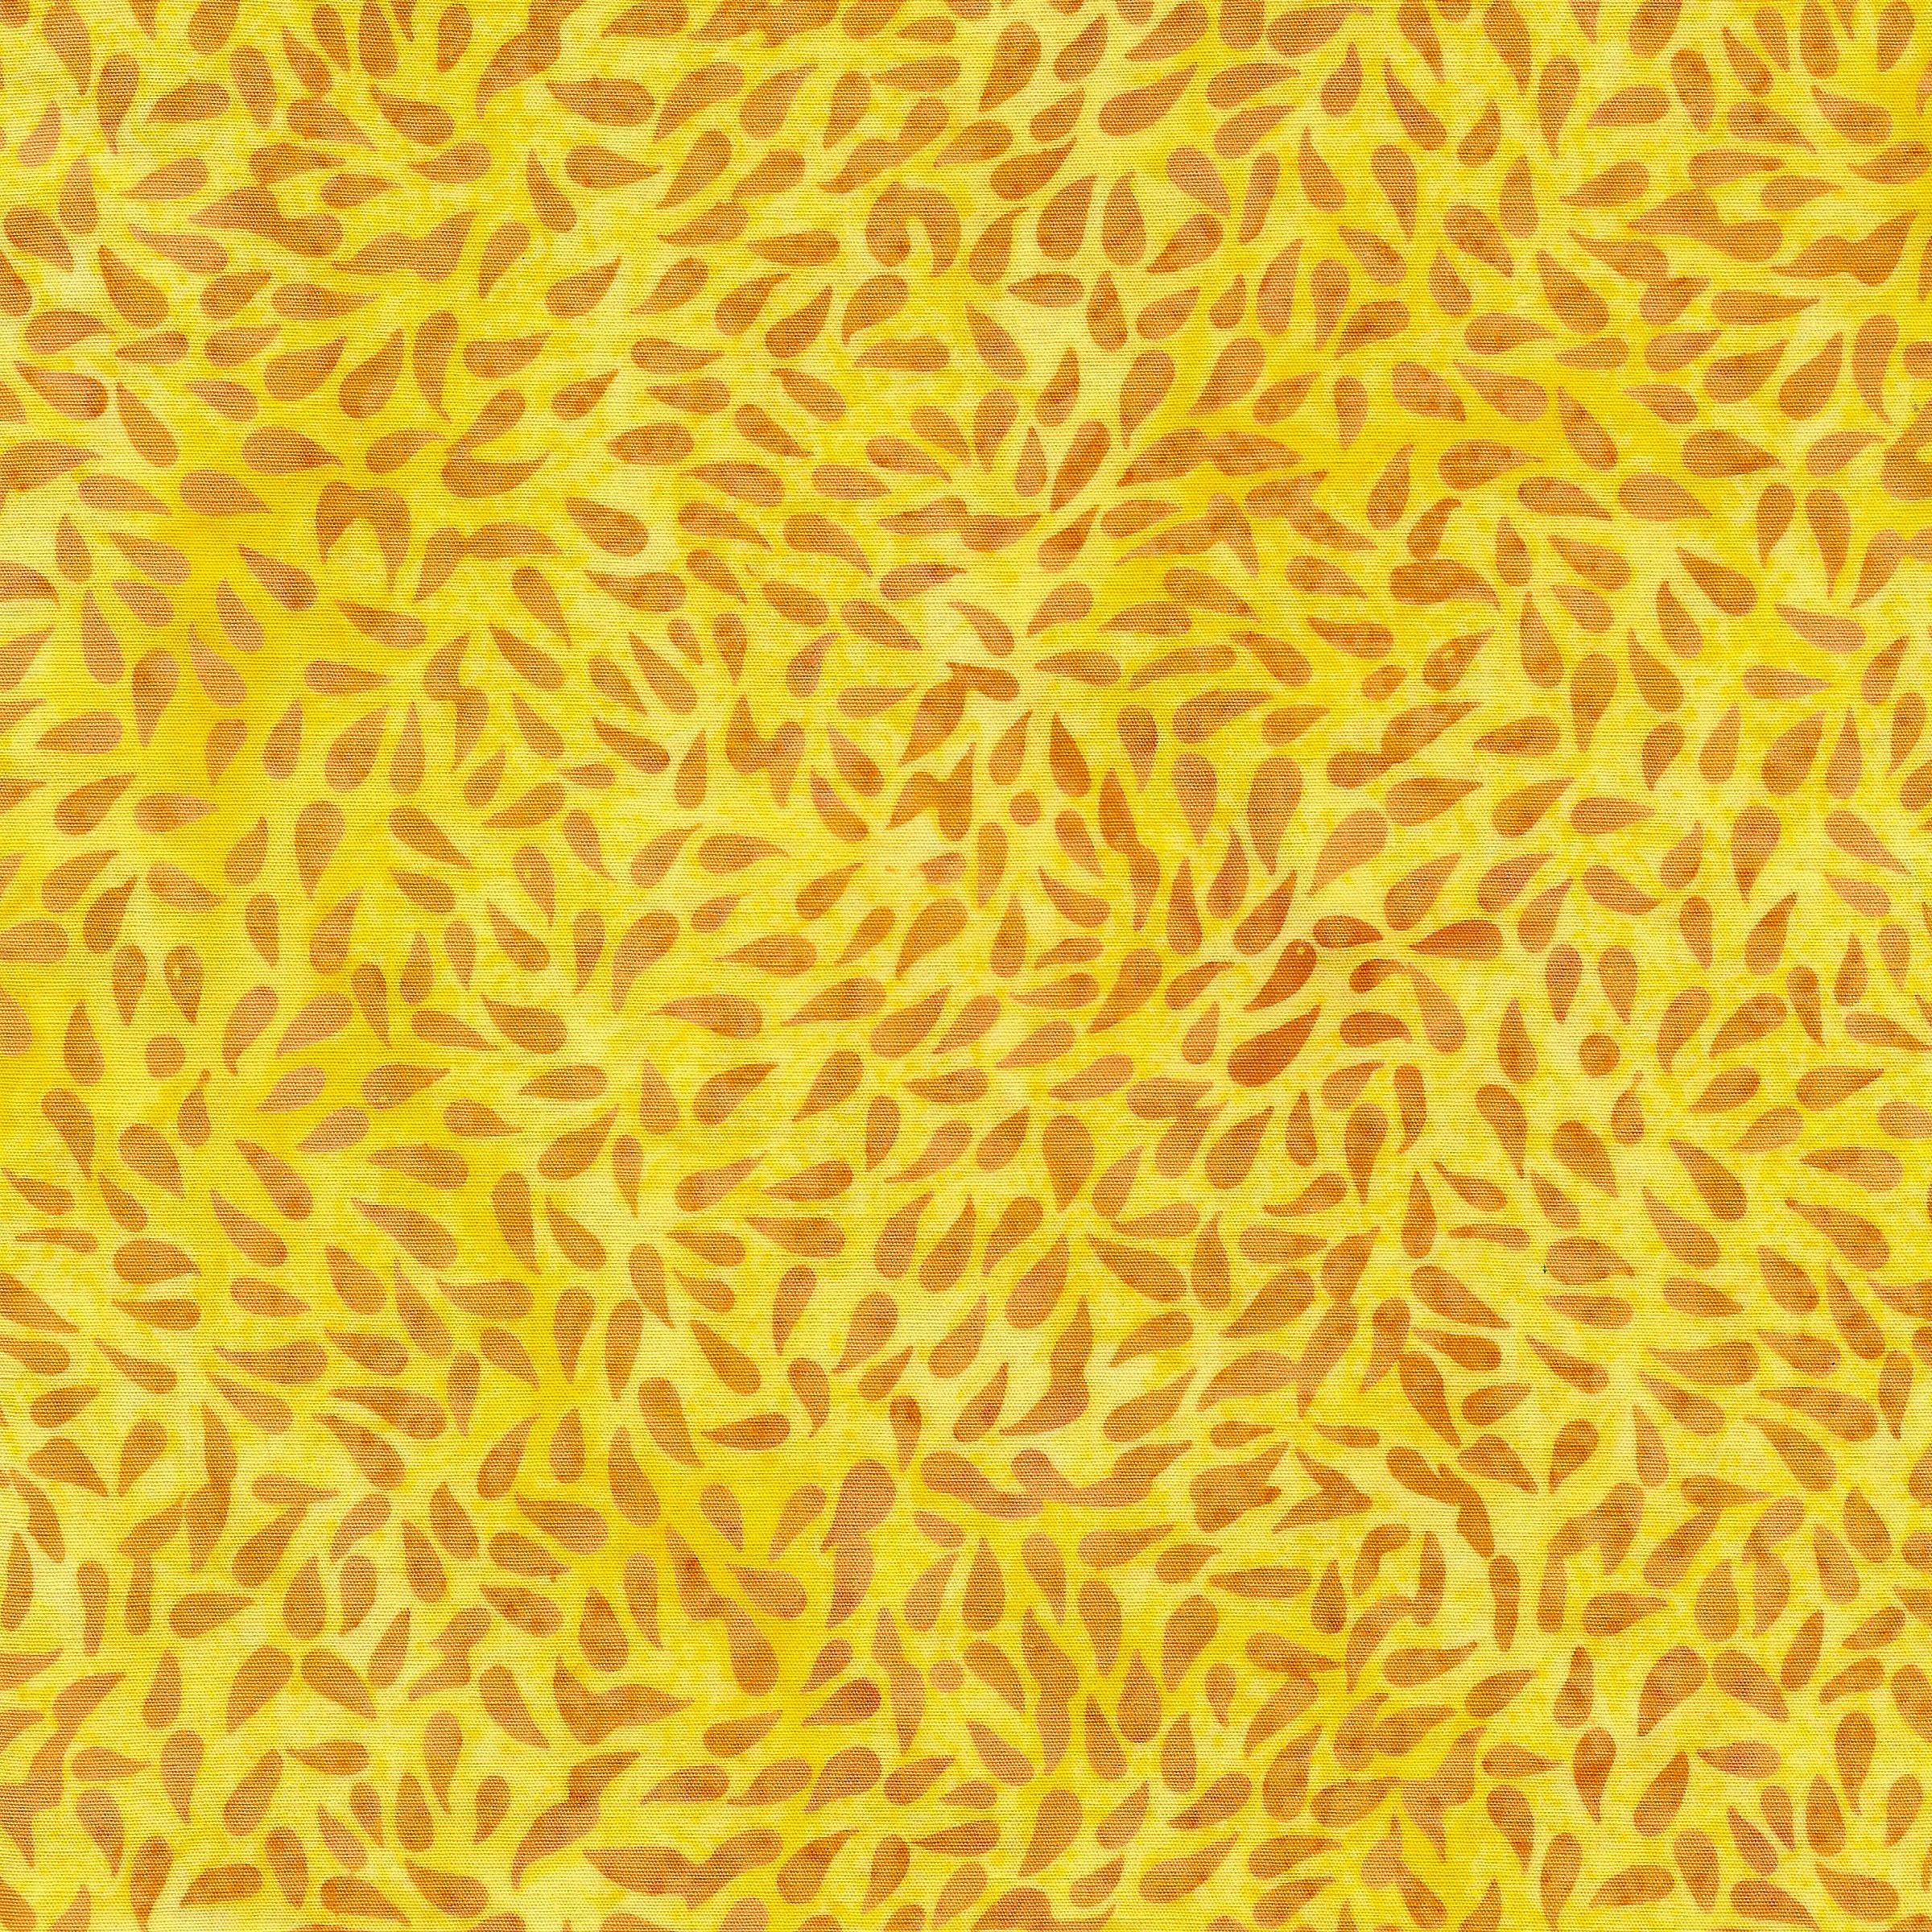 111928120 / Tossed Seeds -Sun